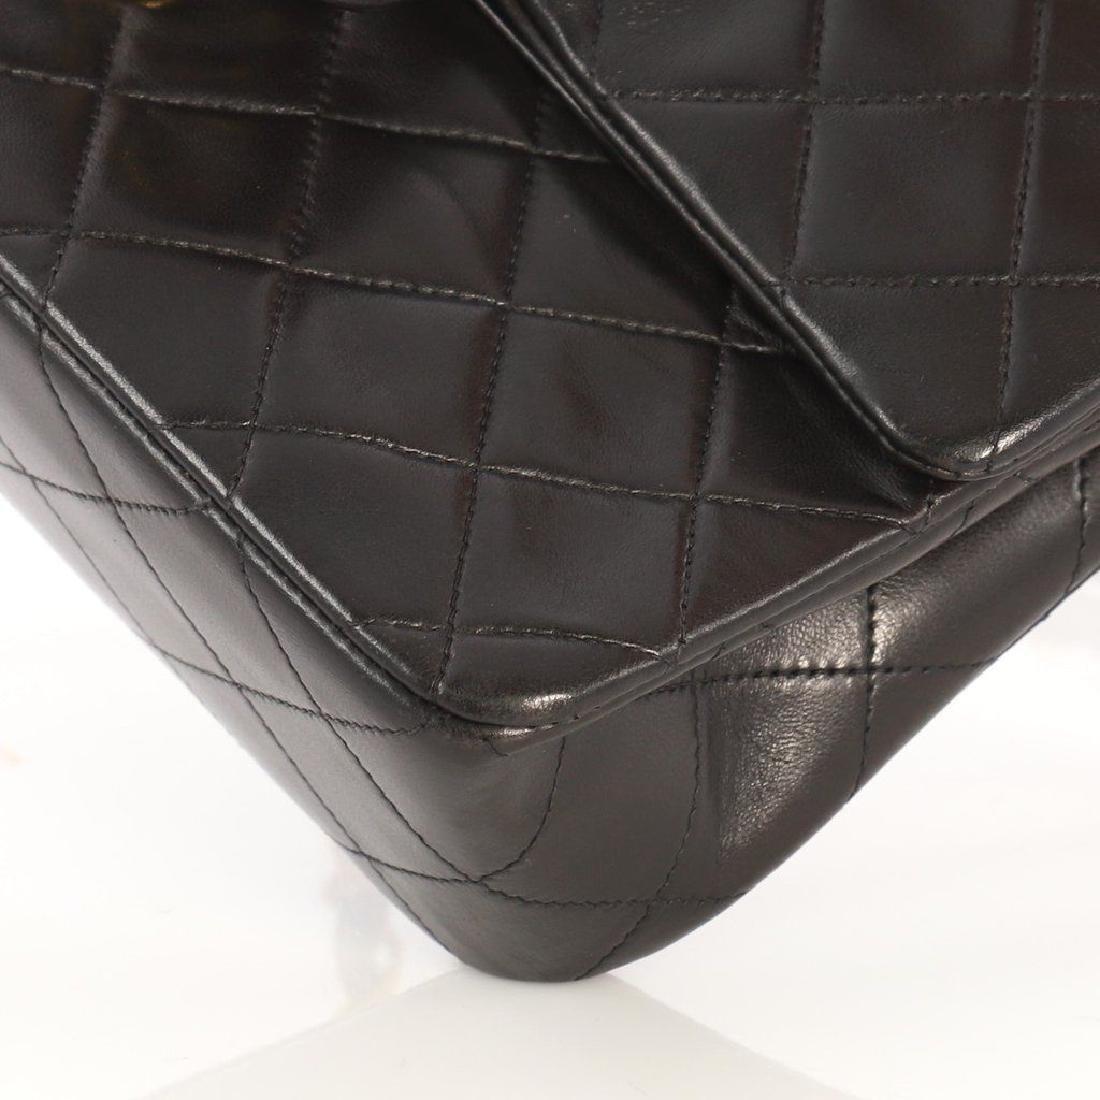 Chanel Double Flap Classic Shoulder Bag Black Lambskin - 7